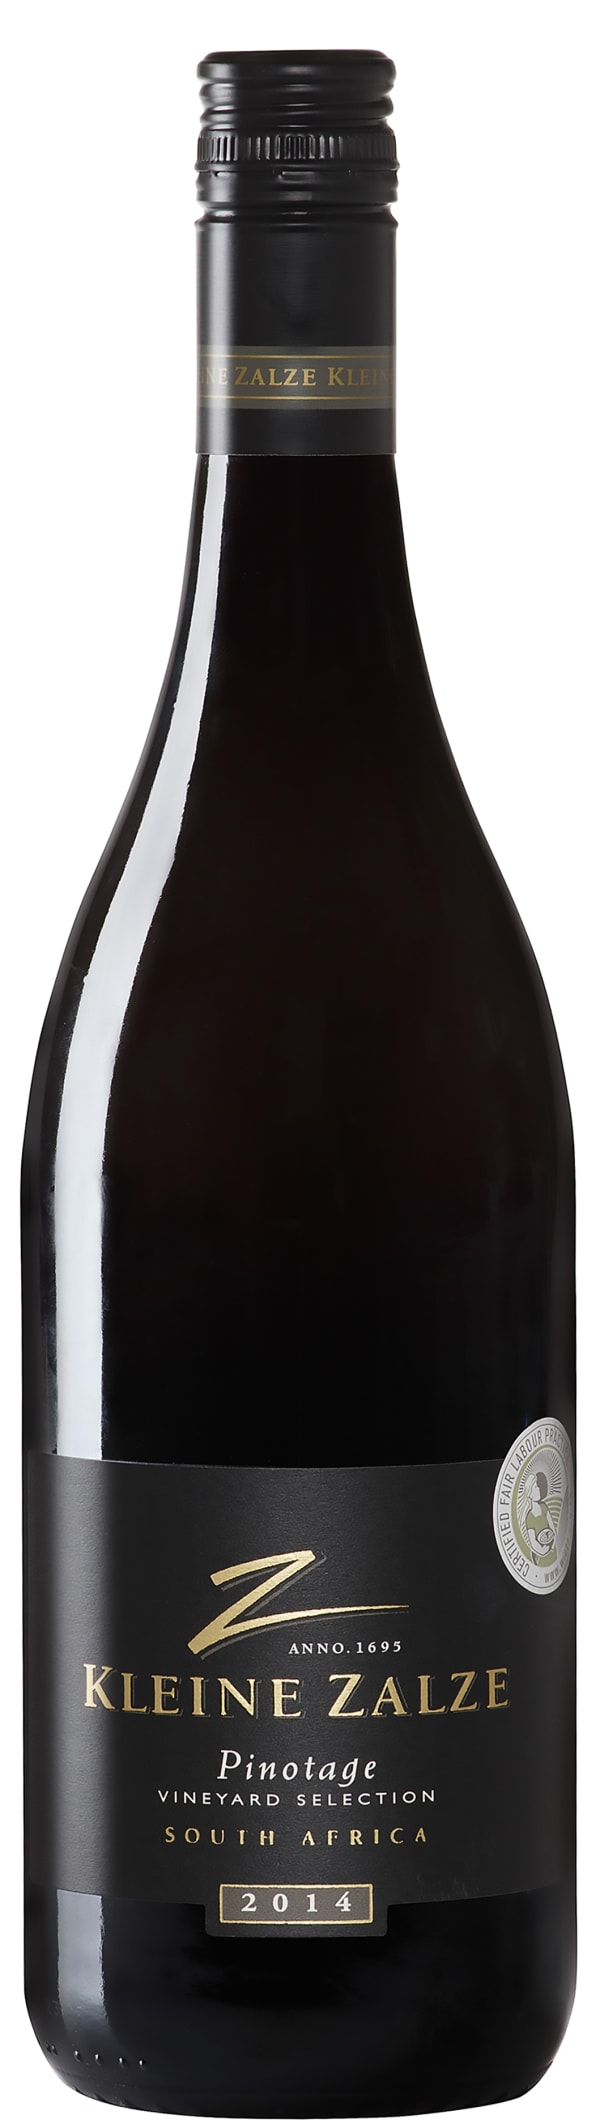 Kleine Zalze Vineyard Selection Pinotage 2015